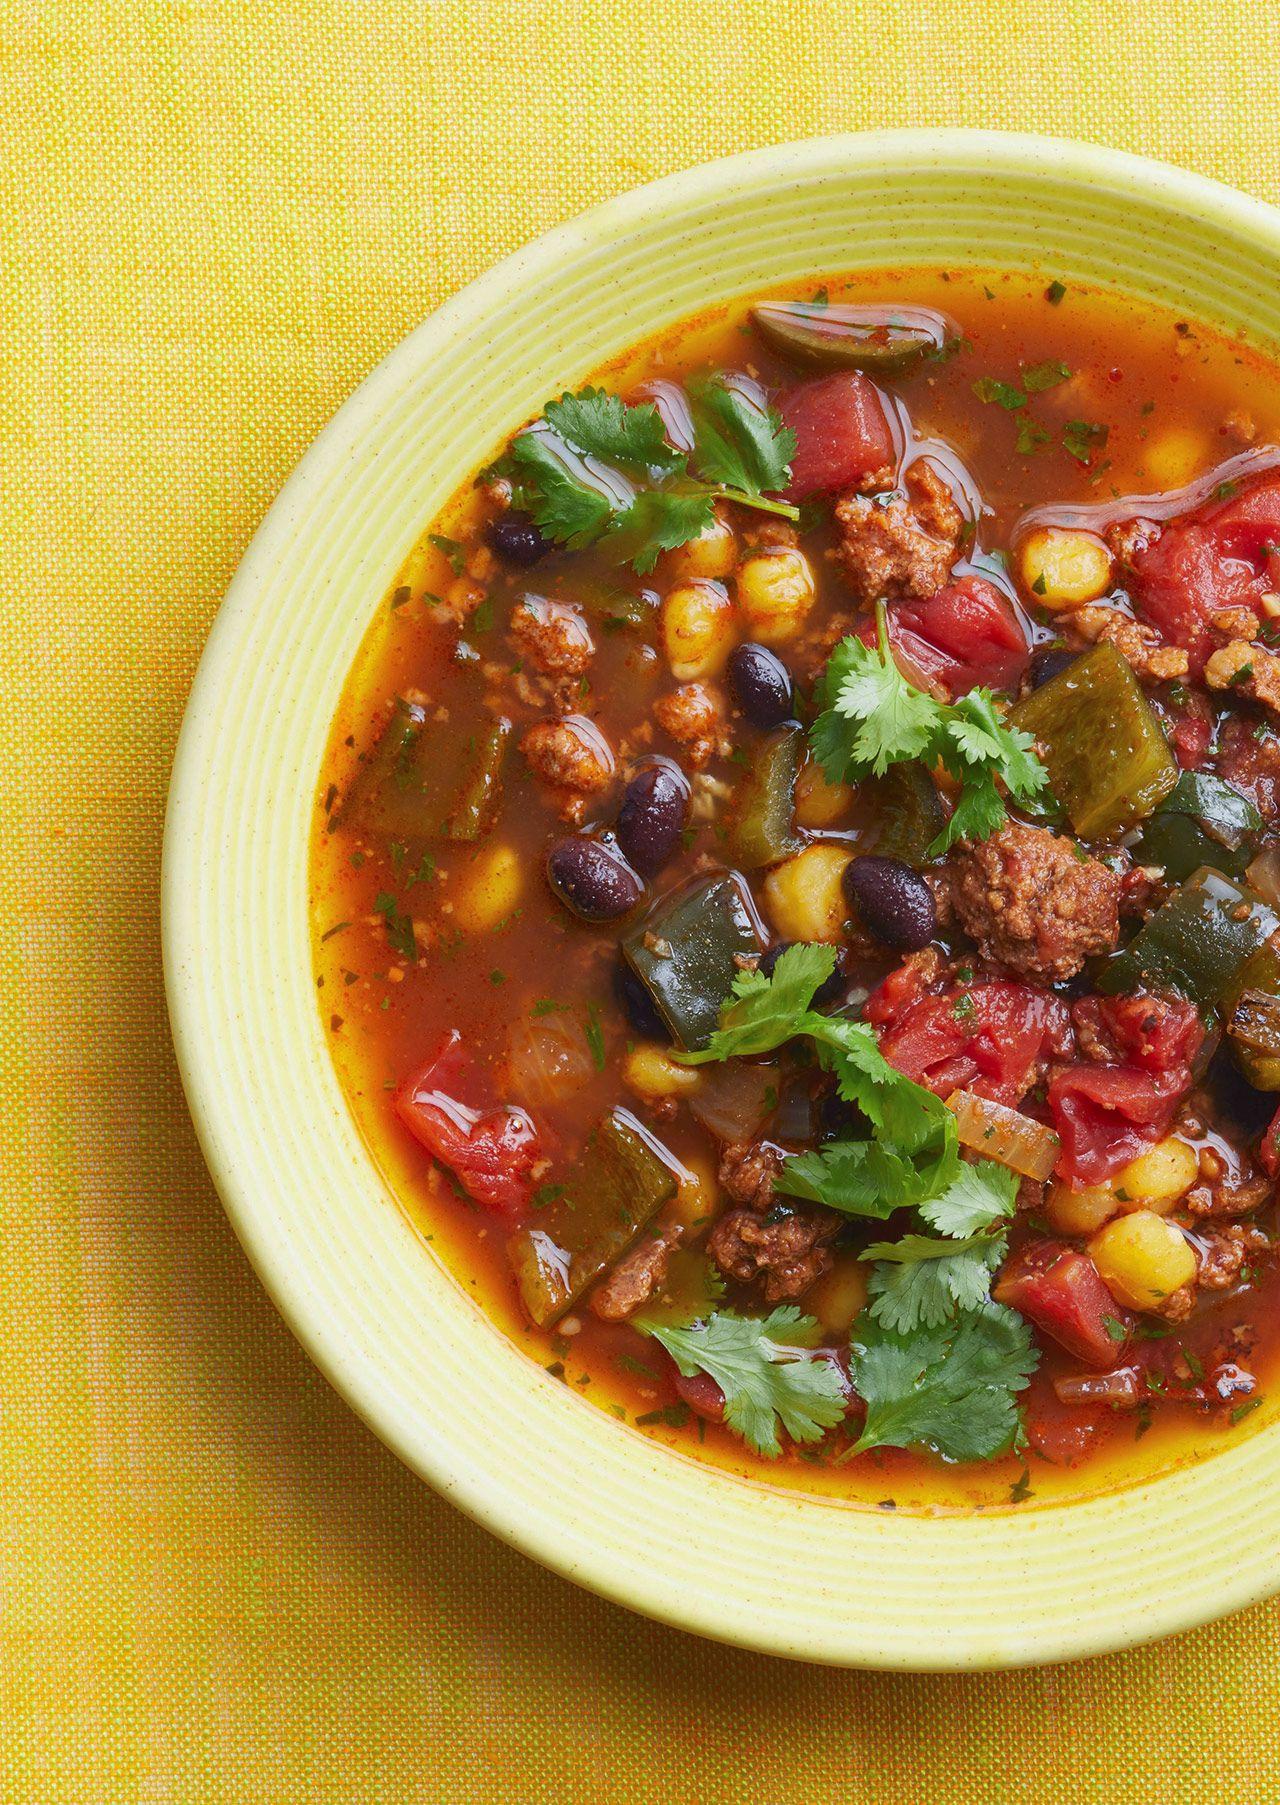 f2dc481a8b25344d46d221470b5677e0 - Chorizo And Lentil Soup Better Homes And Gardens